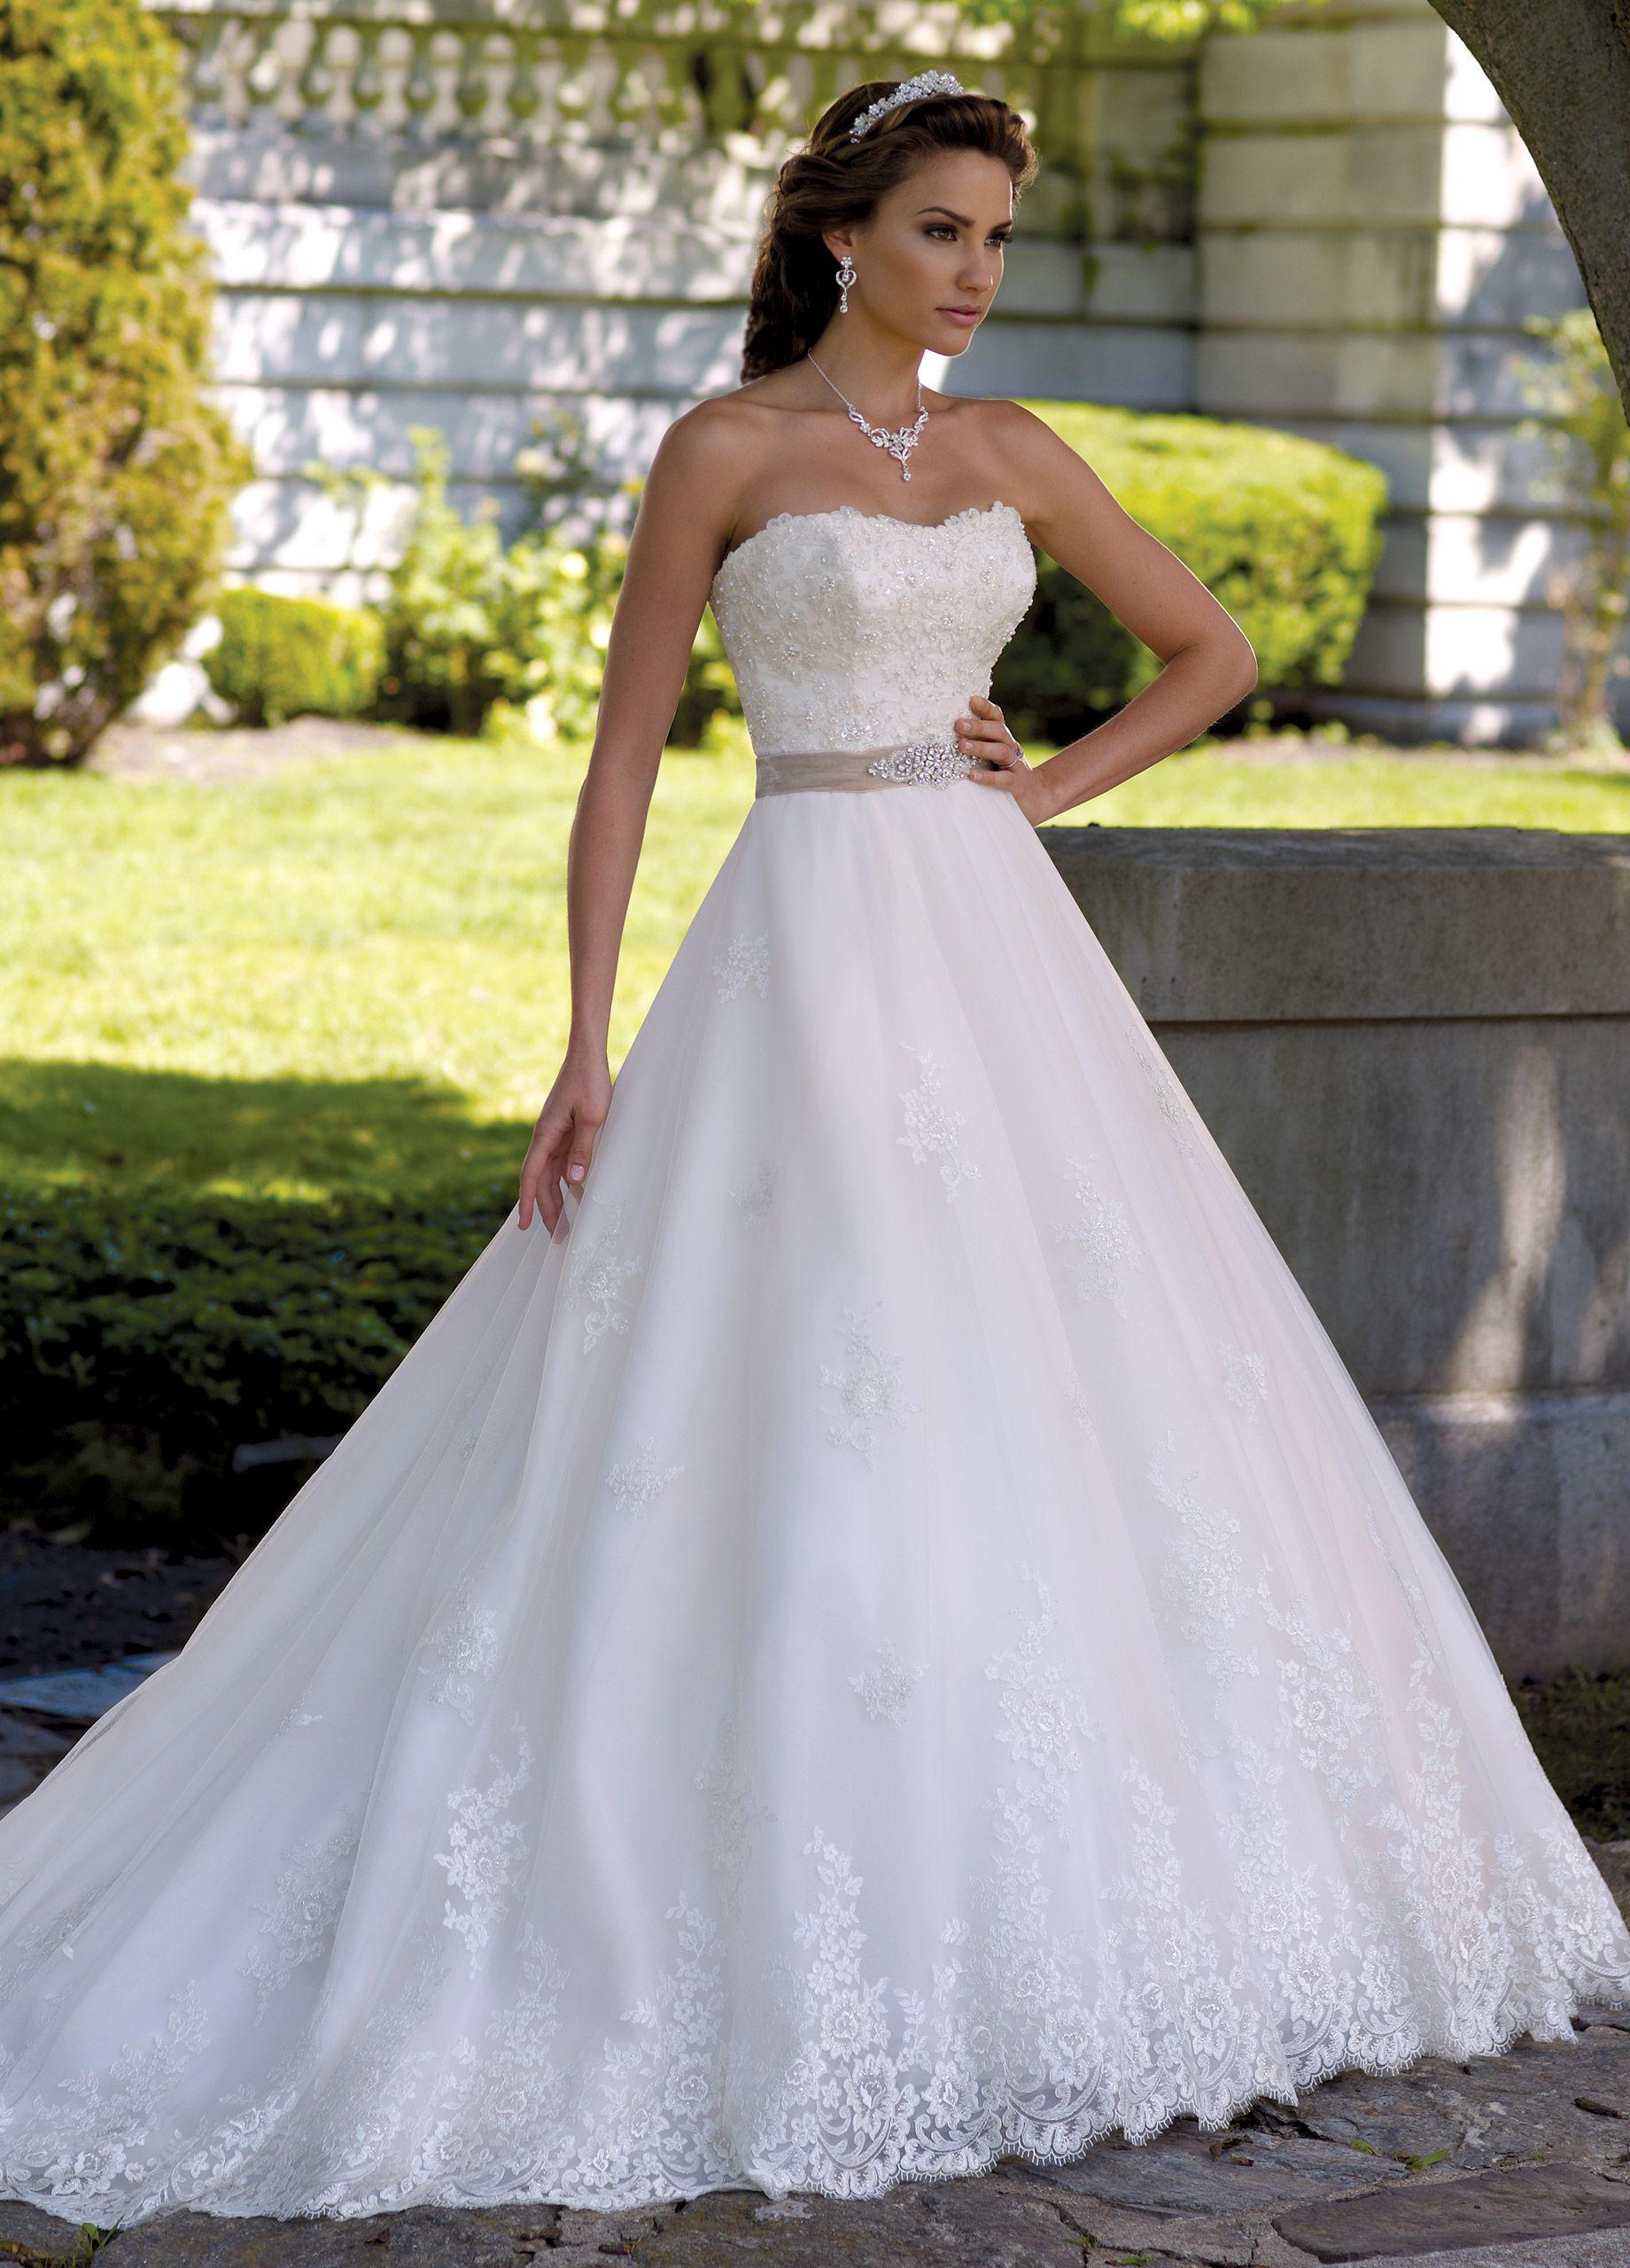 Strapless lace u jeweled ball gown wedding dress margie